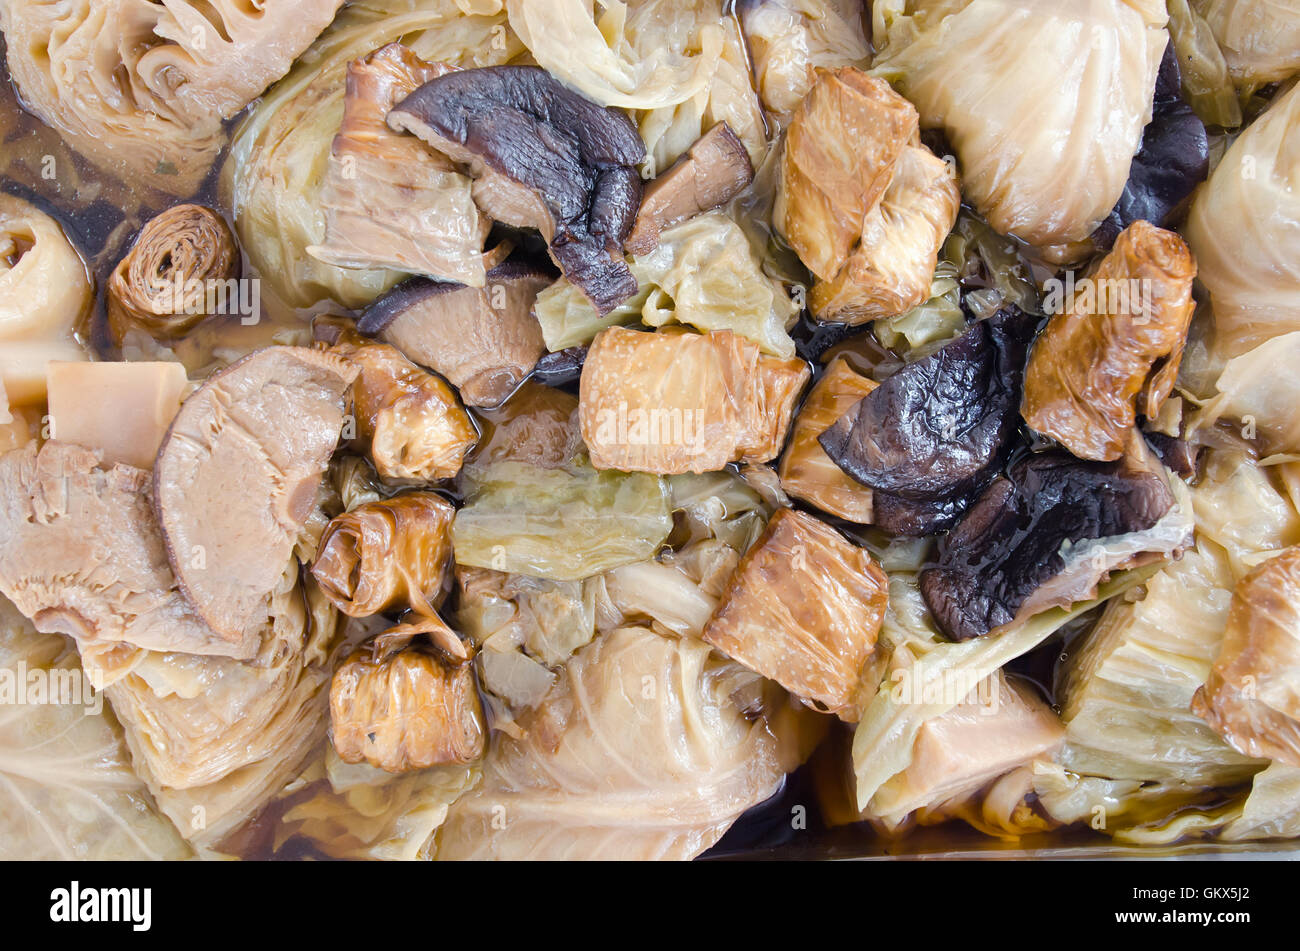 Thai Celery Stockfotos & Thai Celery Bilder - Alamy